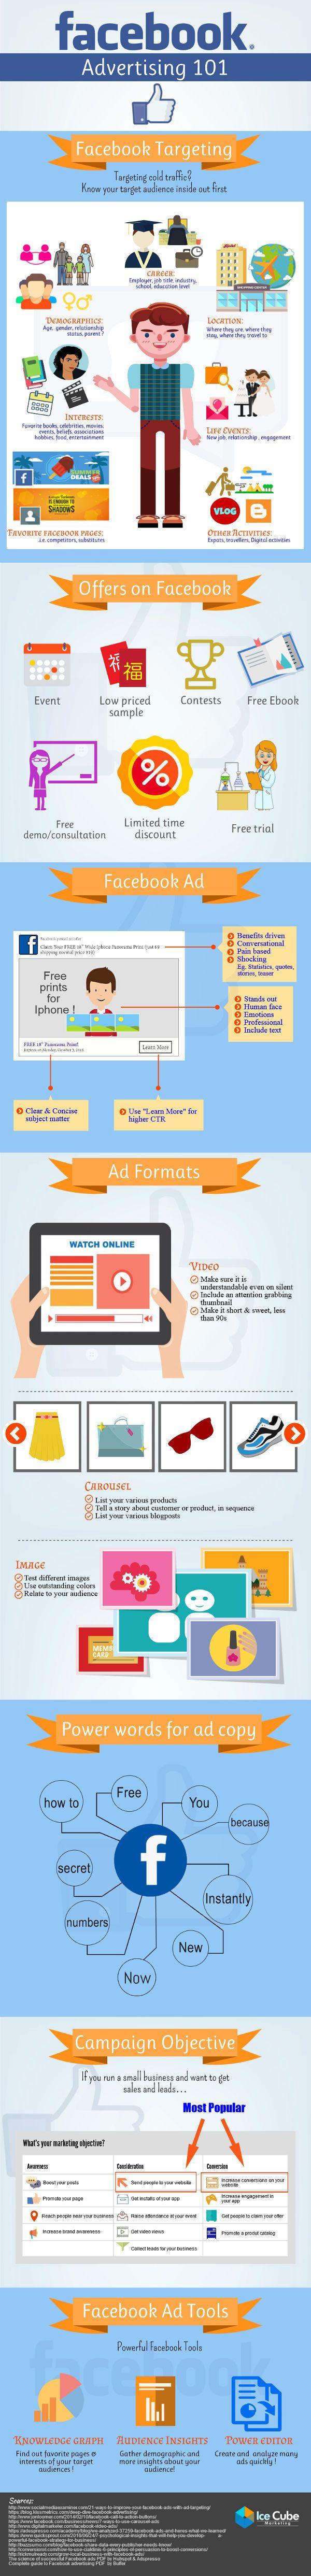 facebook advertising 101 infographic cd pinterest rh pinterest com Facebook for Business 101 101 Facebook Status